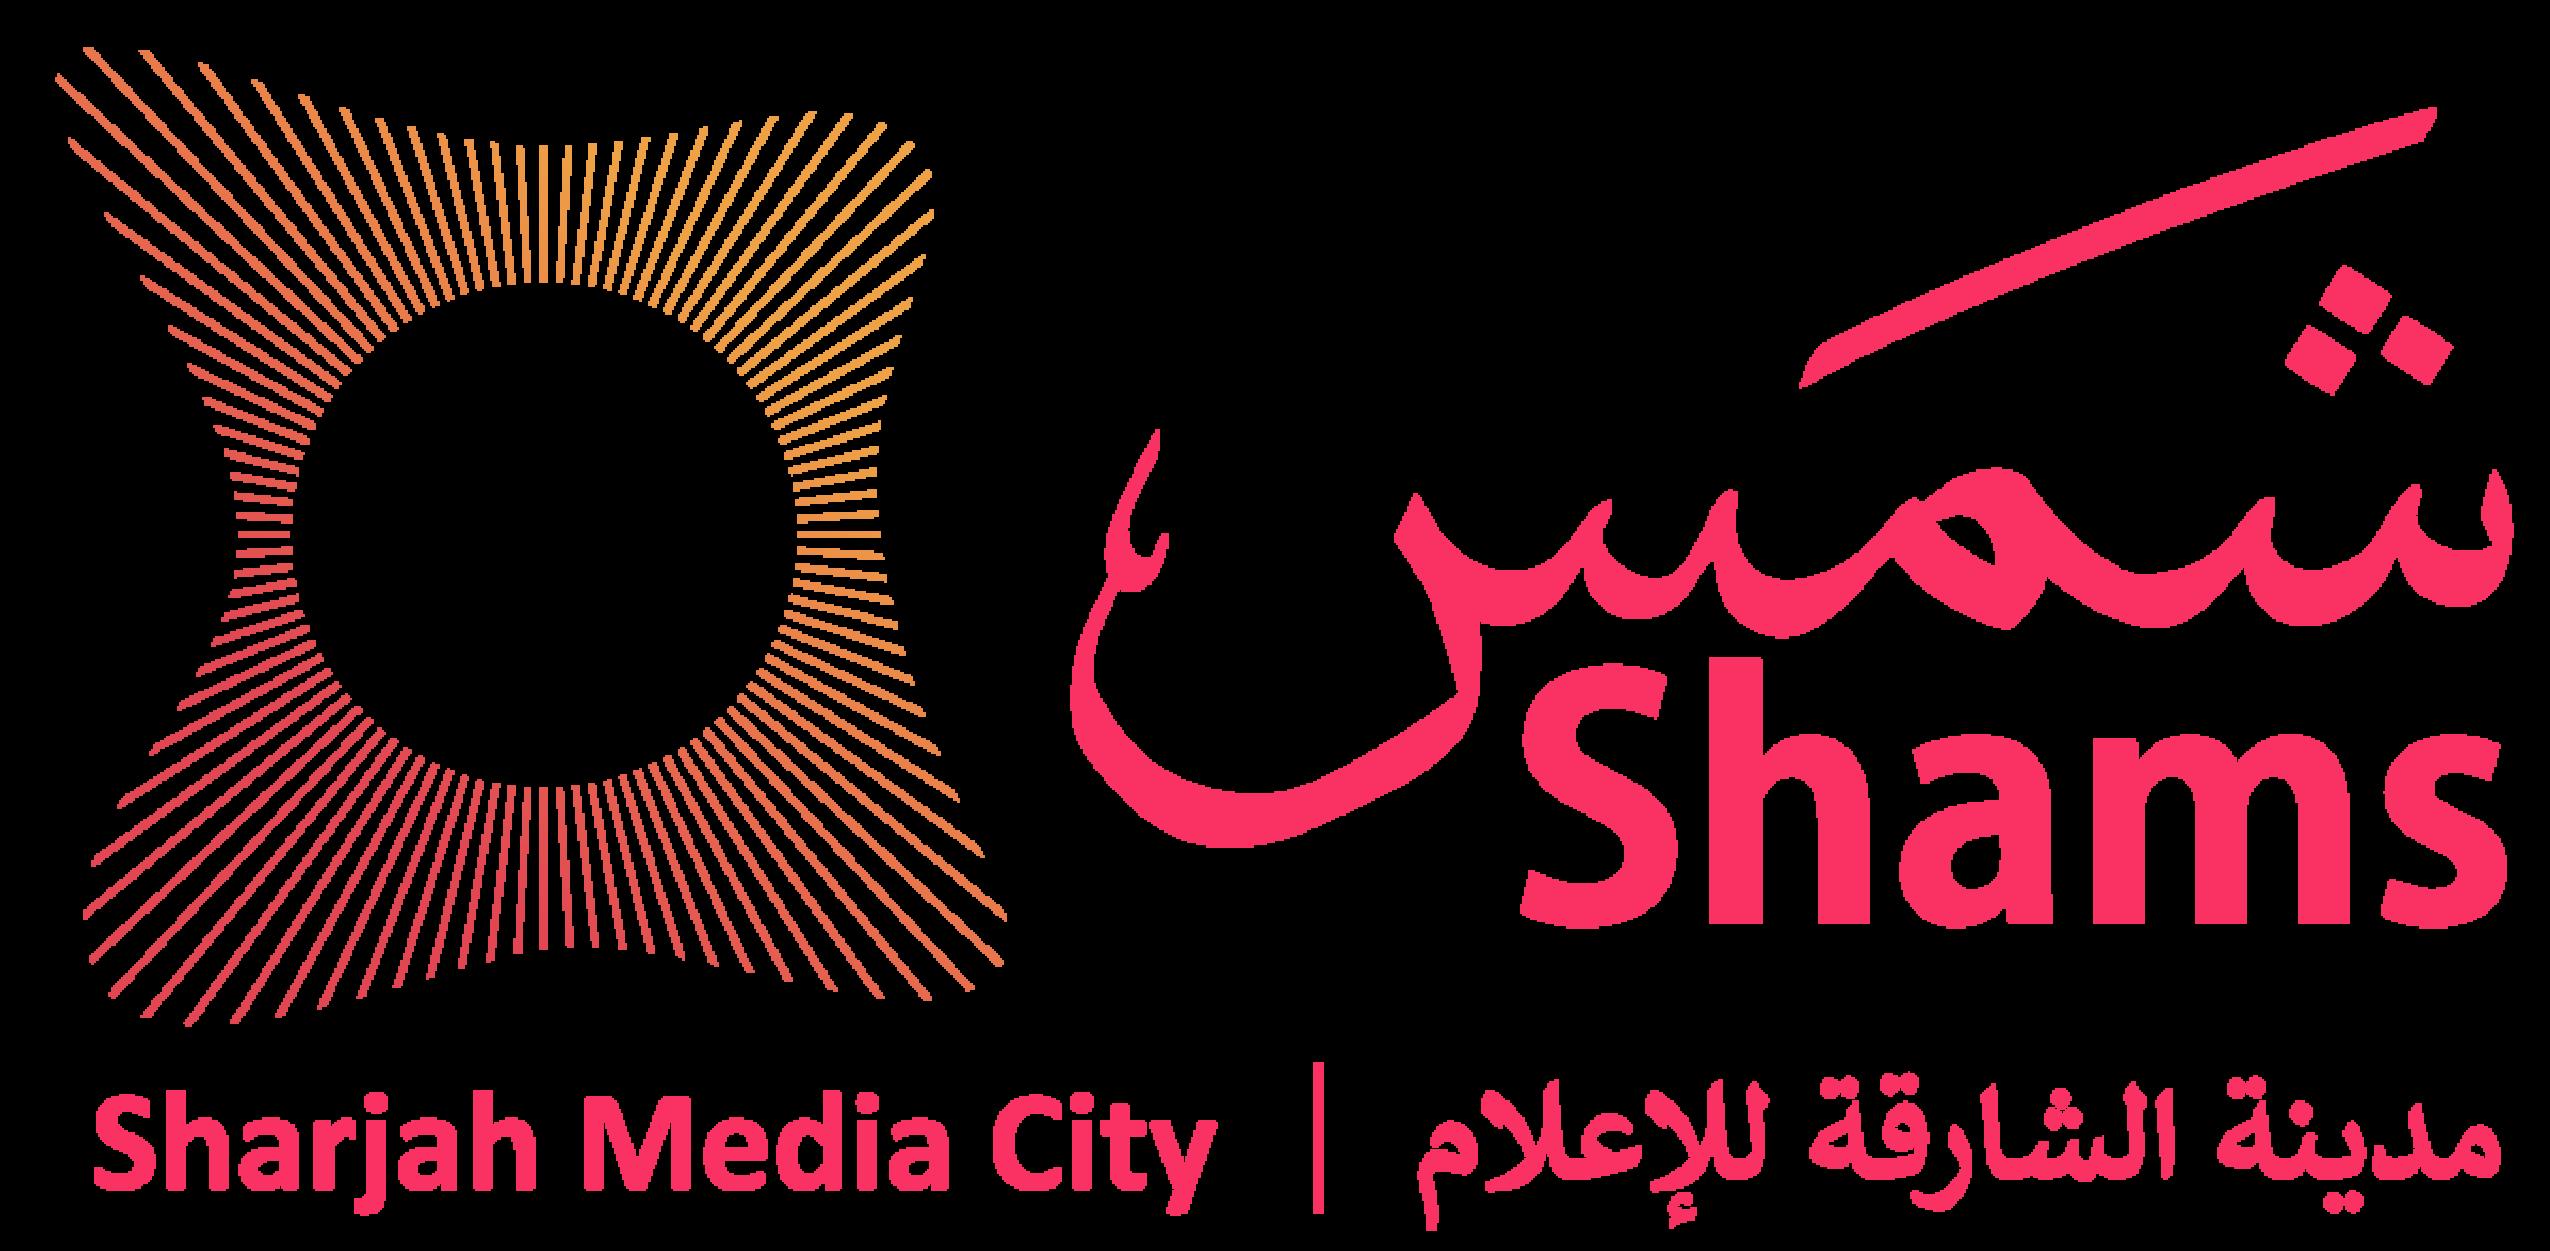 Sharjah News and Media.